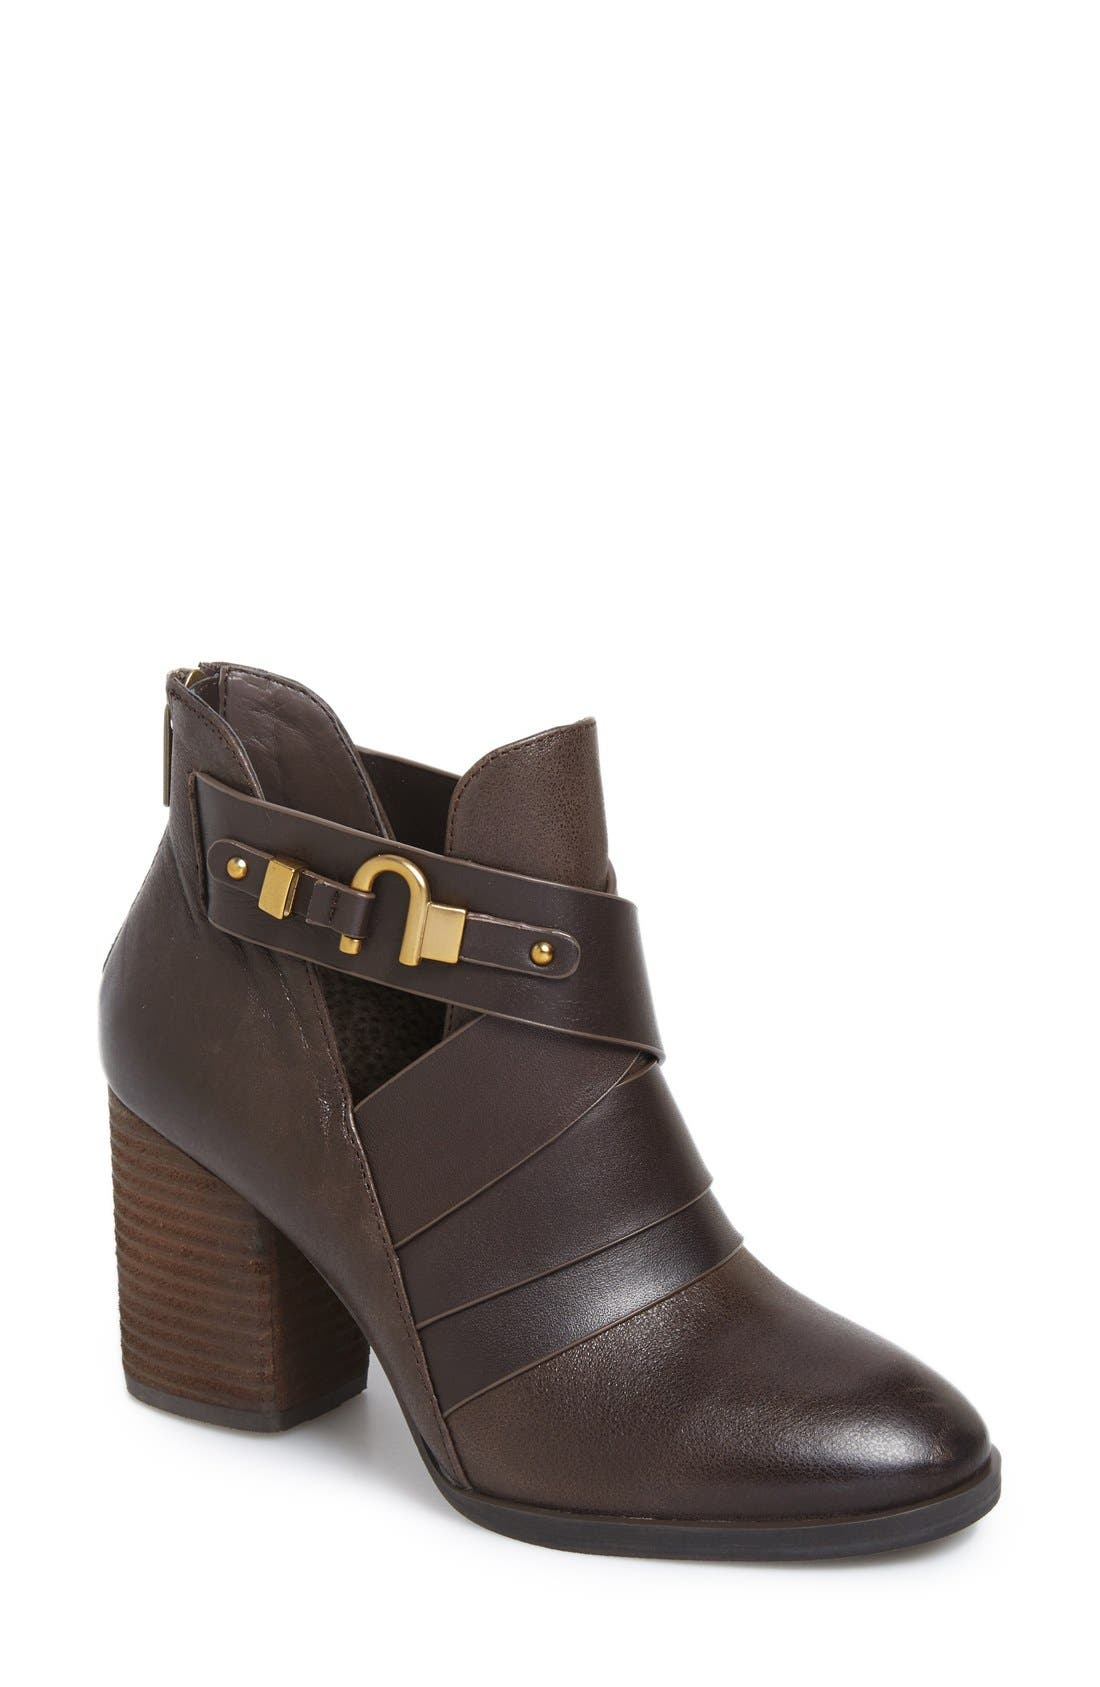 Isolà 'Ladora' Block Heel Bootie,                         Main,                         color, Dark Brown Leather